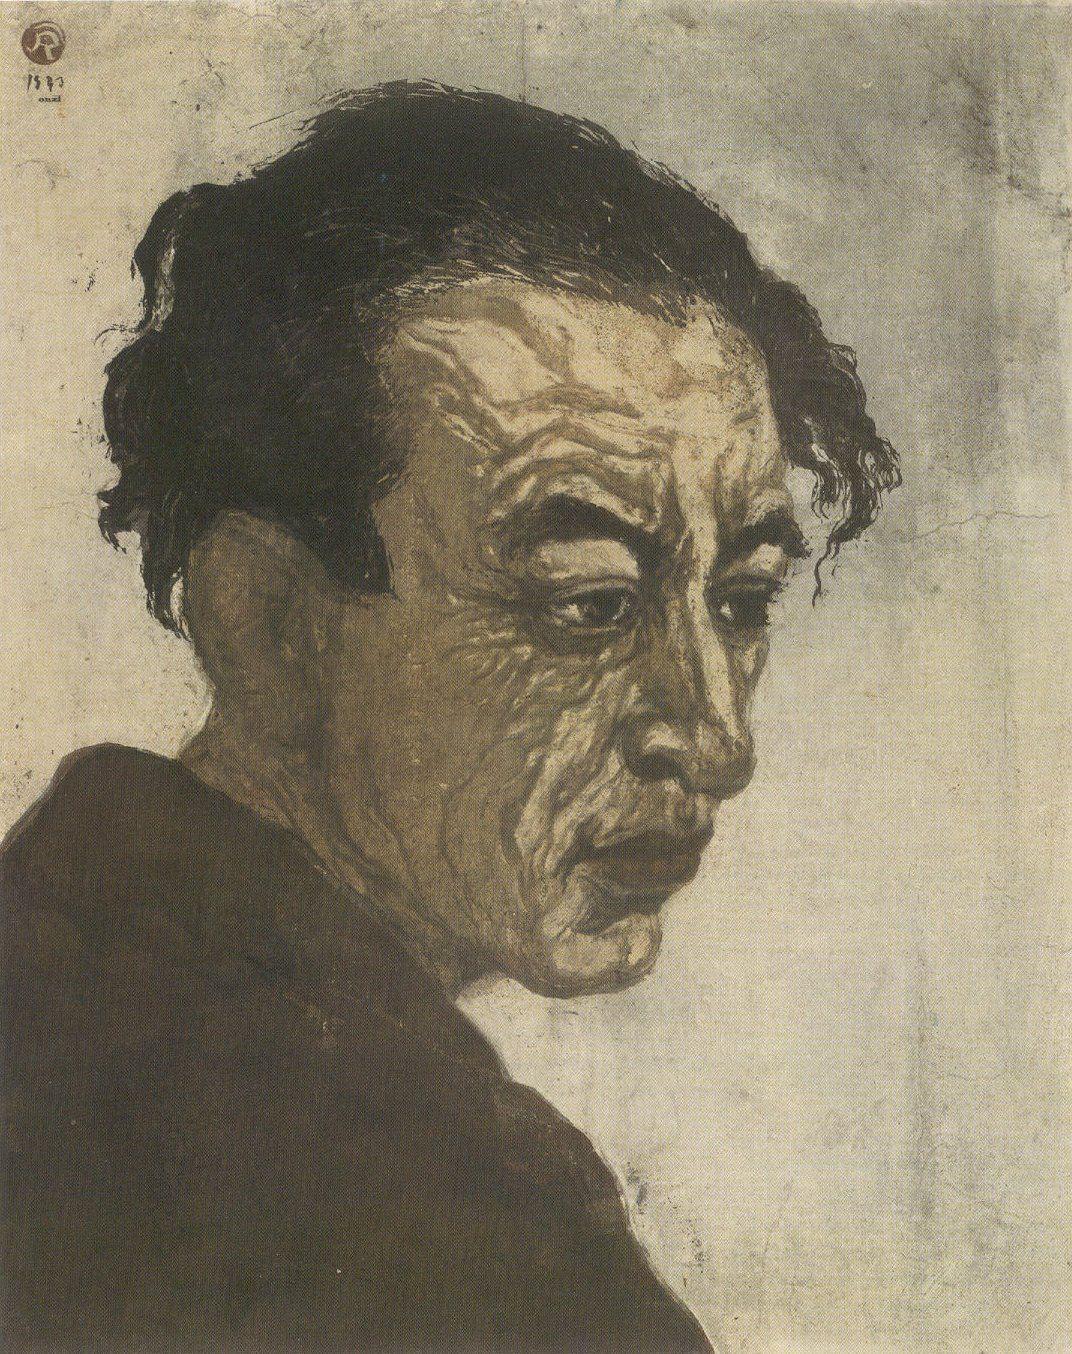 portrait of hagiwara sakutaro woodblock print by onchi koshiro 1943 1st edition national museum mod portrat ideen holzschnitt fur moderne kunst bilder auf leinwand malen